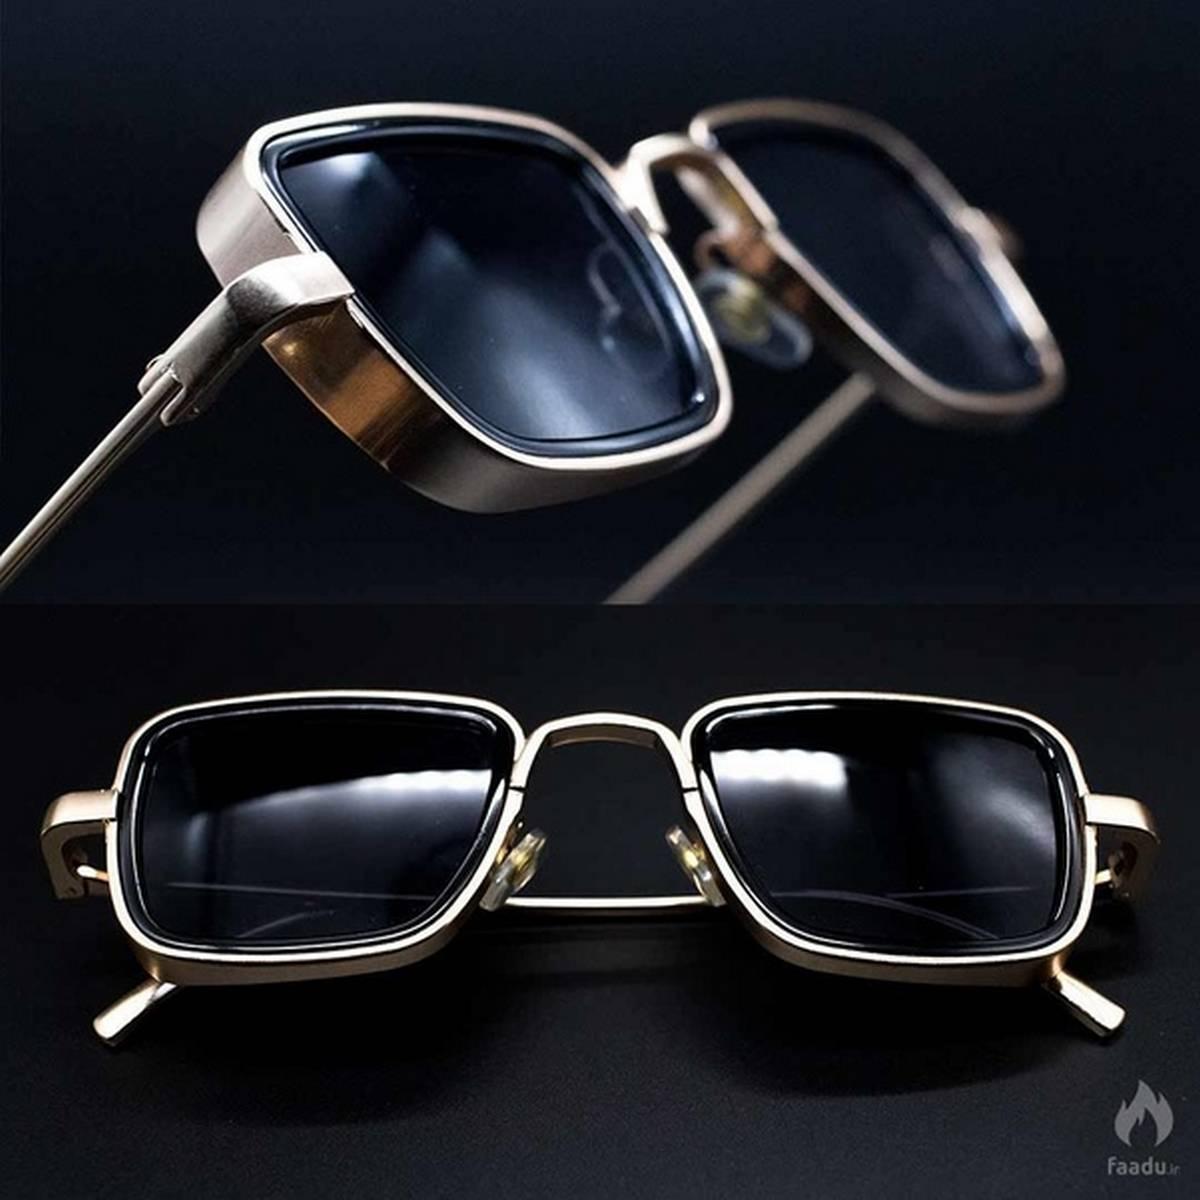 Shahid Kapoor-Kabir Singh Sunglasses - Men Square Frame Cool Sun Shades Brand Design for Male  A+